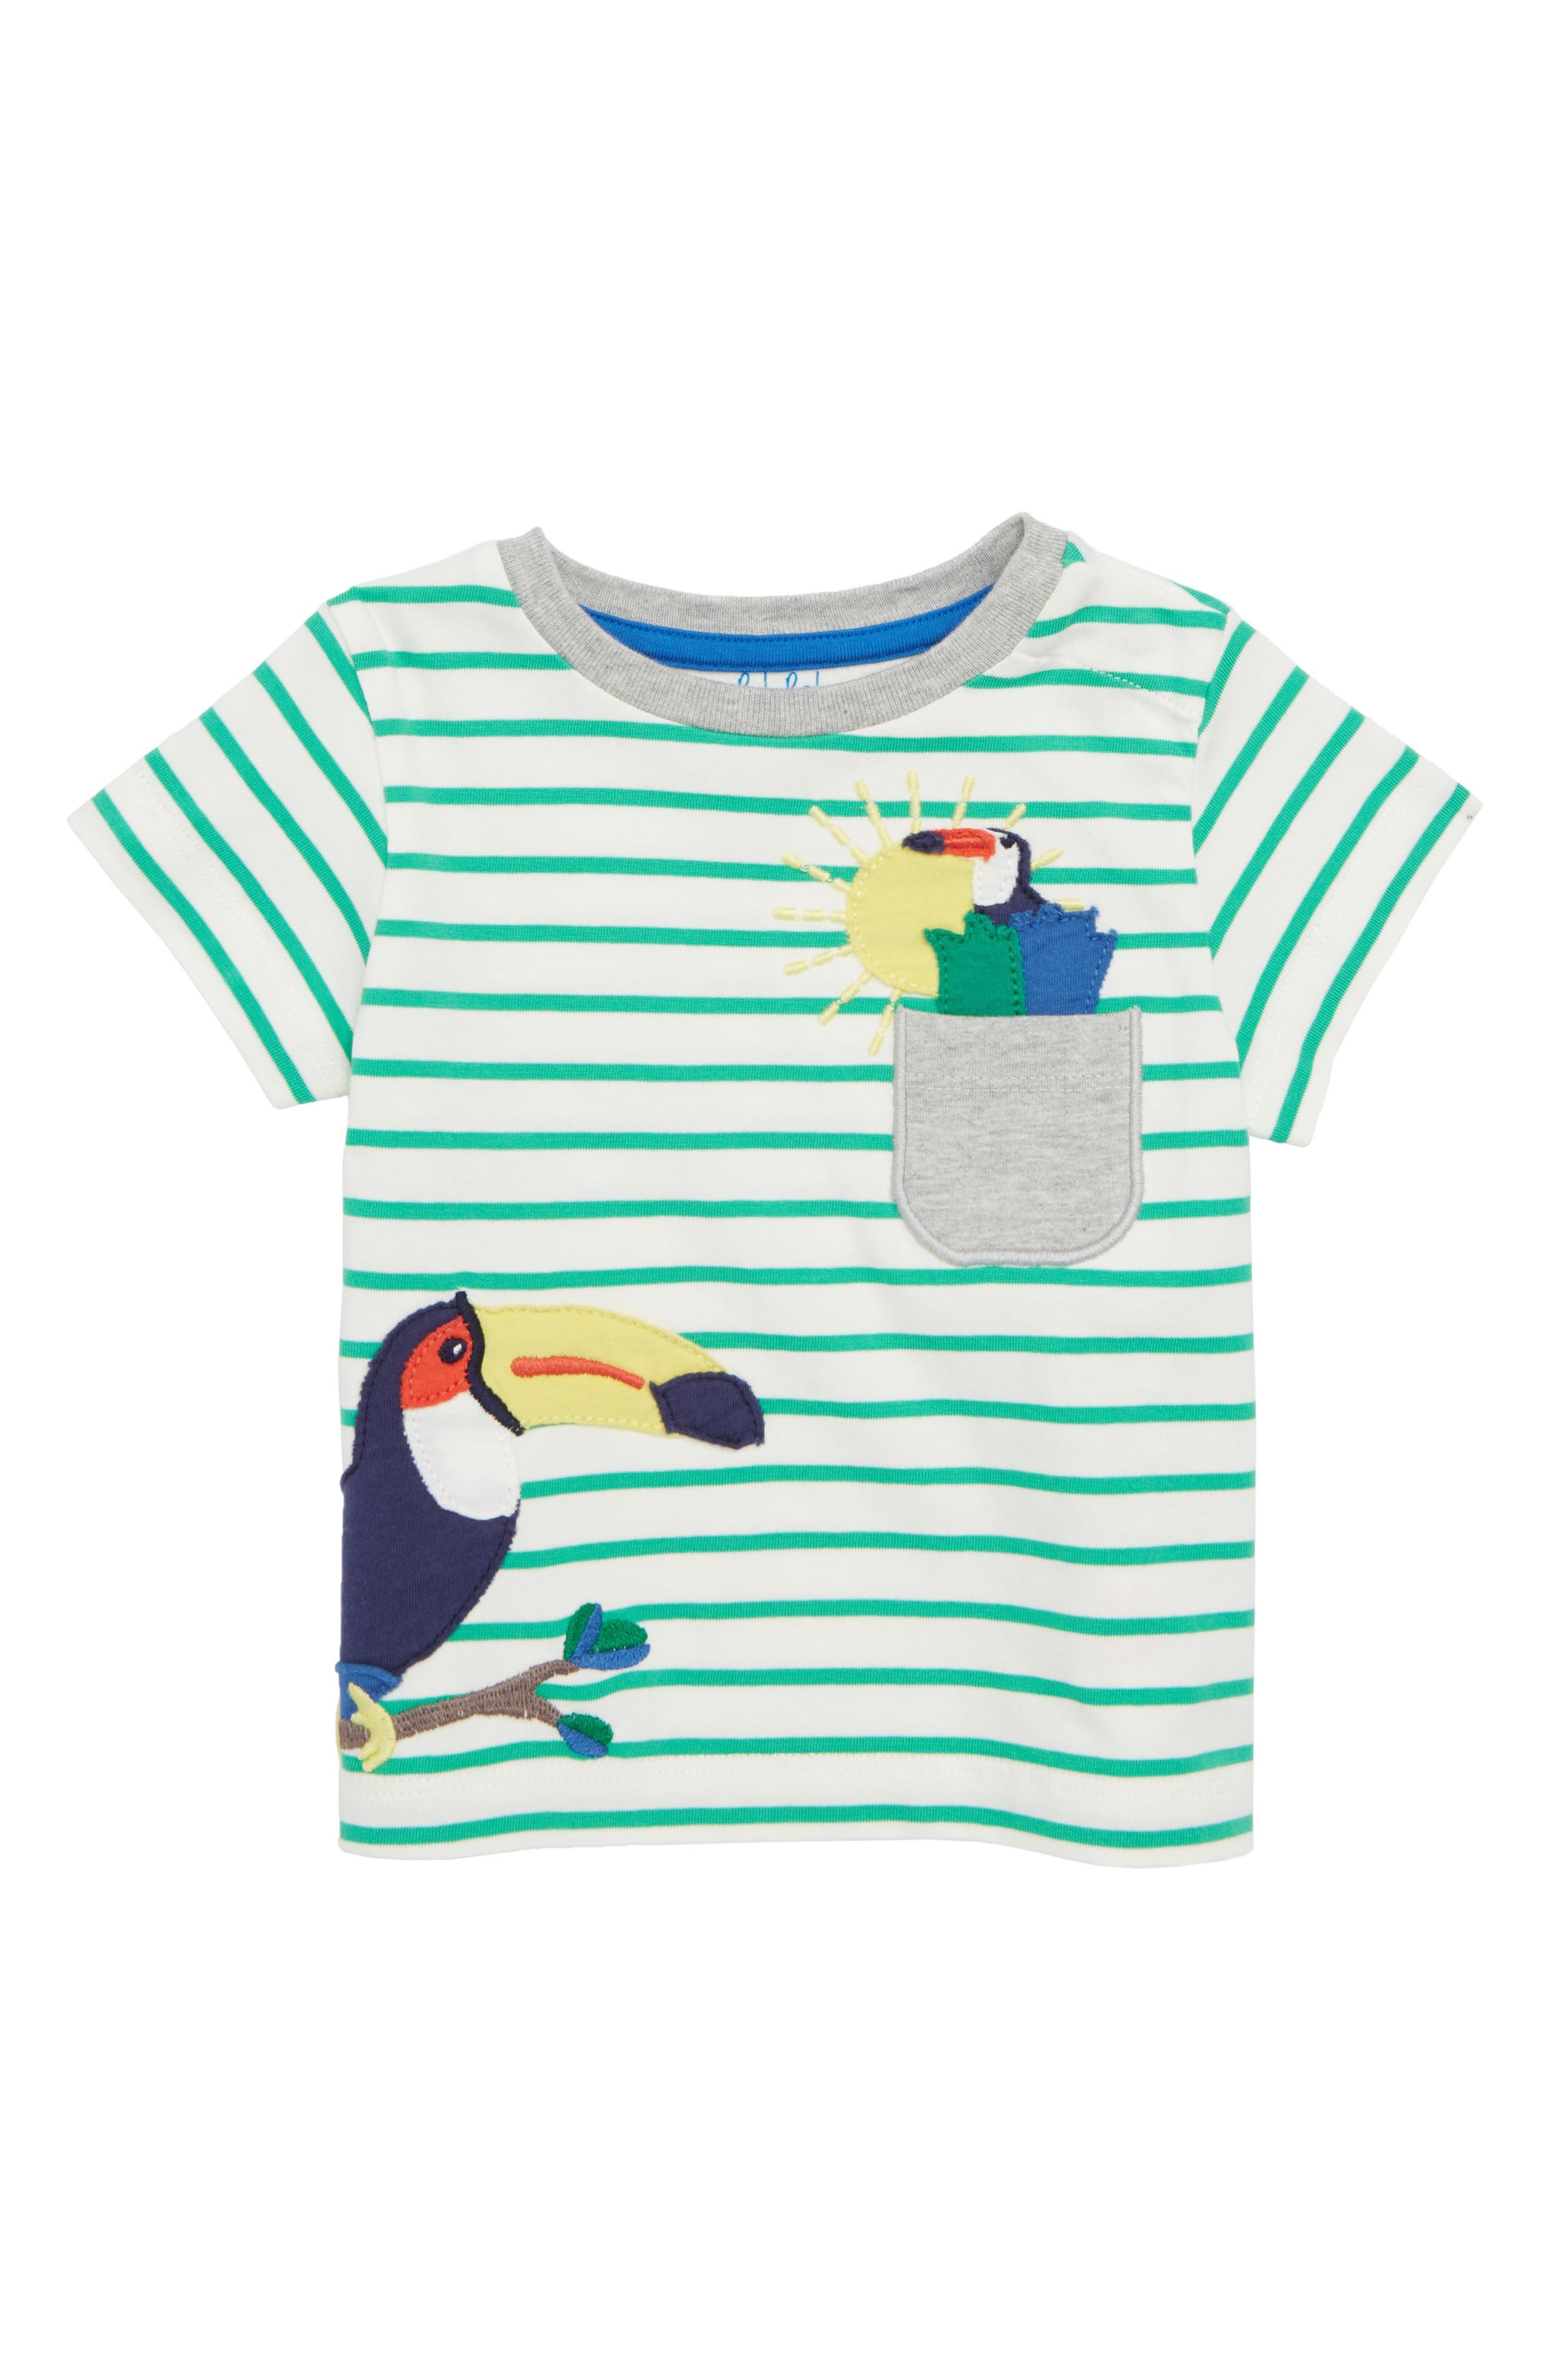 Pocket Friends T-Shirt,                             Main thumbnail 1, color,                             315